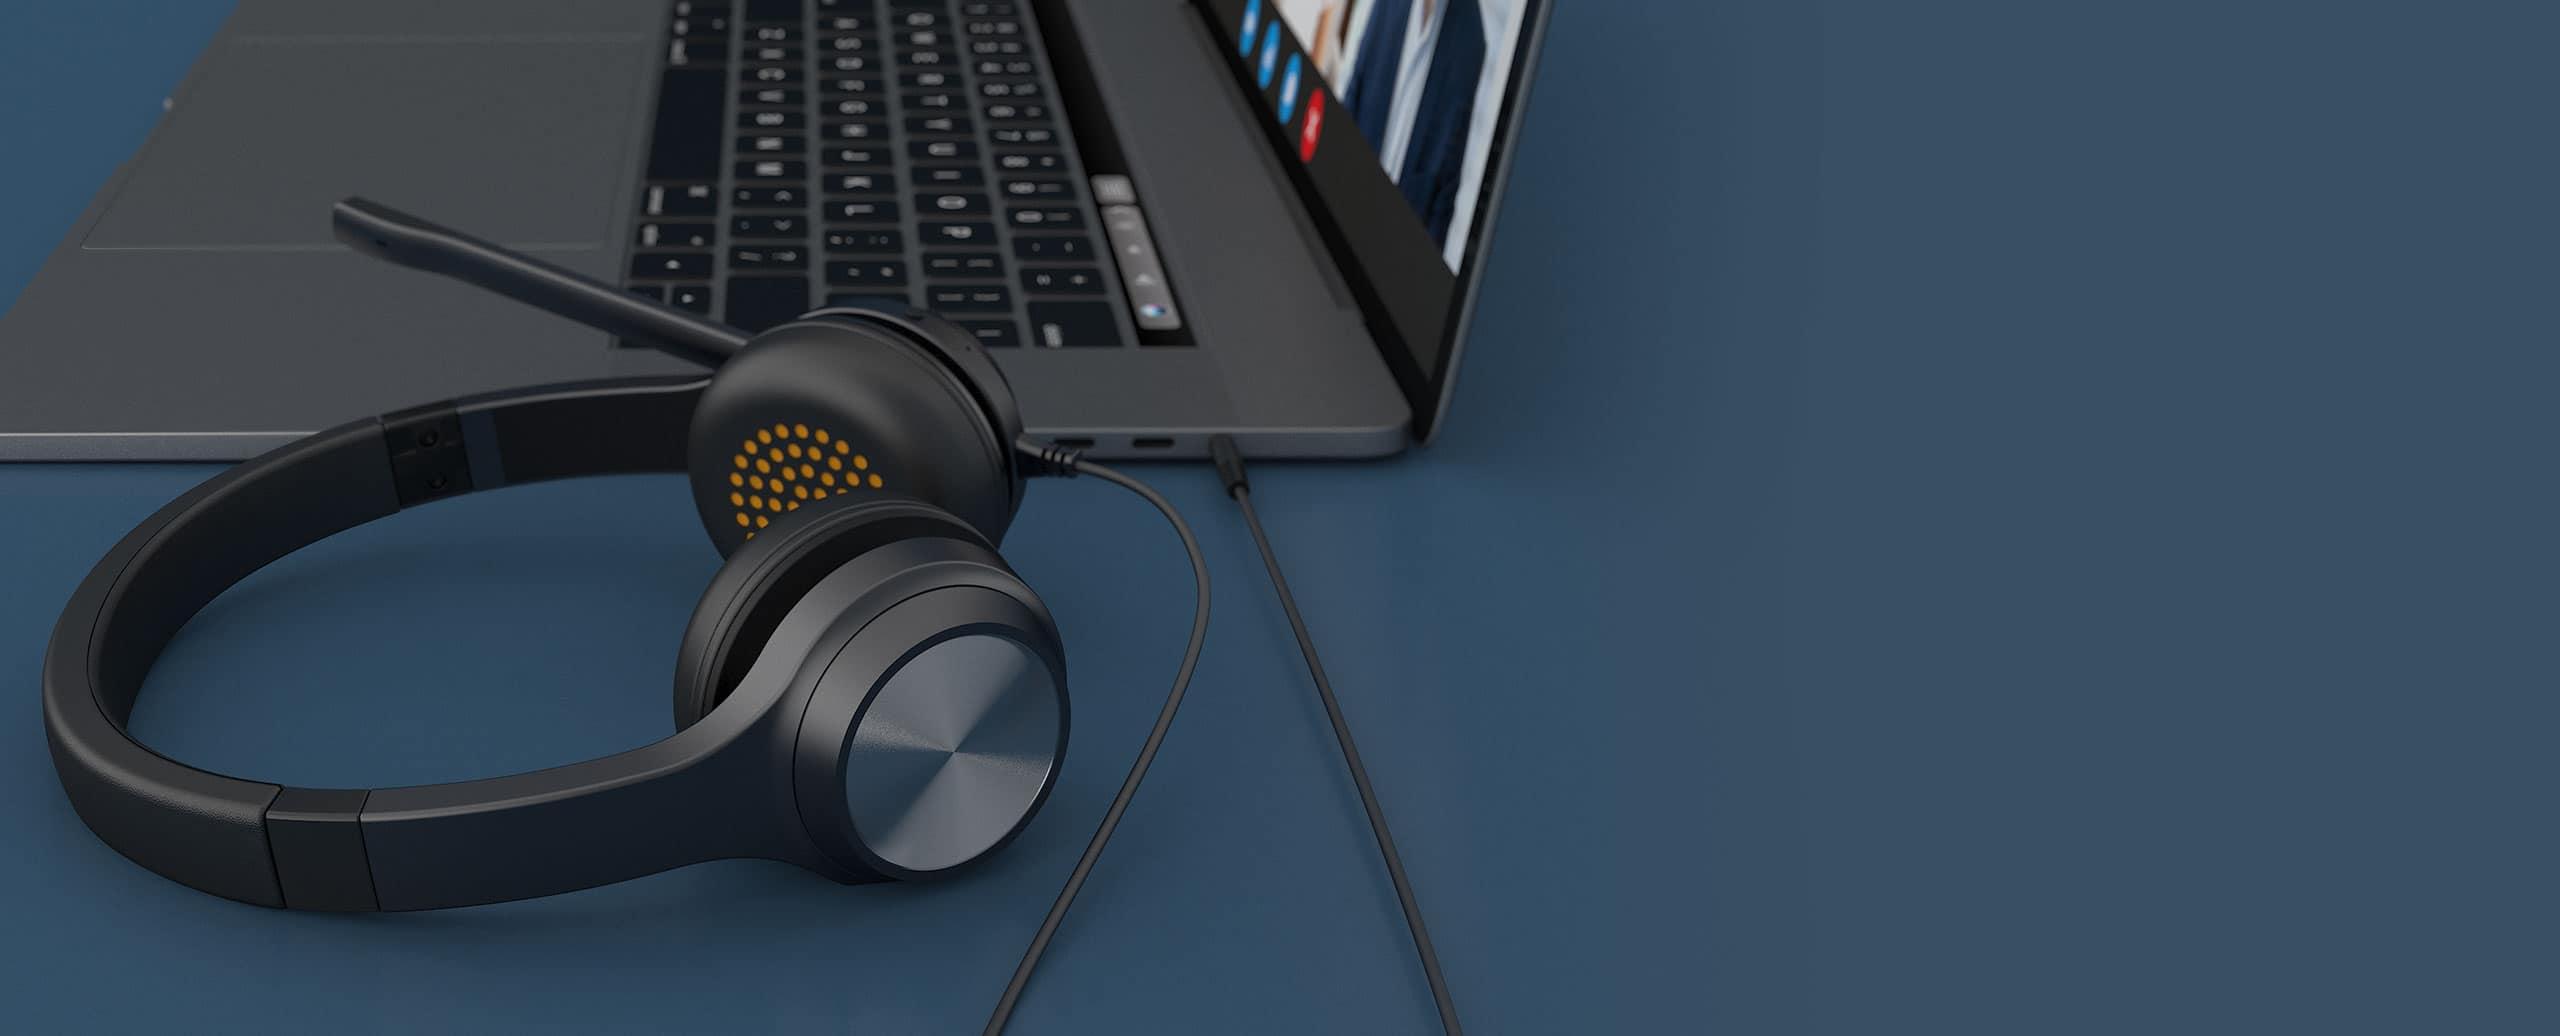 Creative Chat: il nuovo headset plug-and-play per le comunicazioni online thumbnail